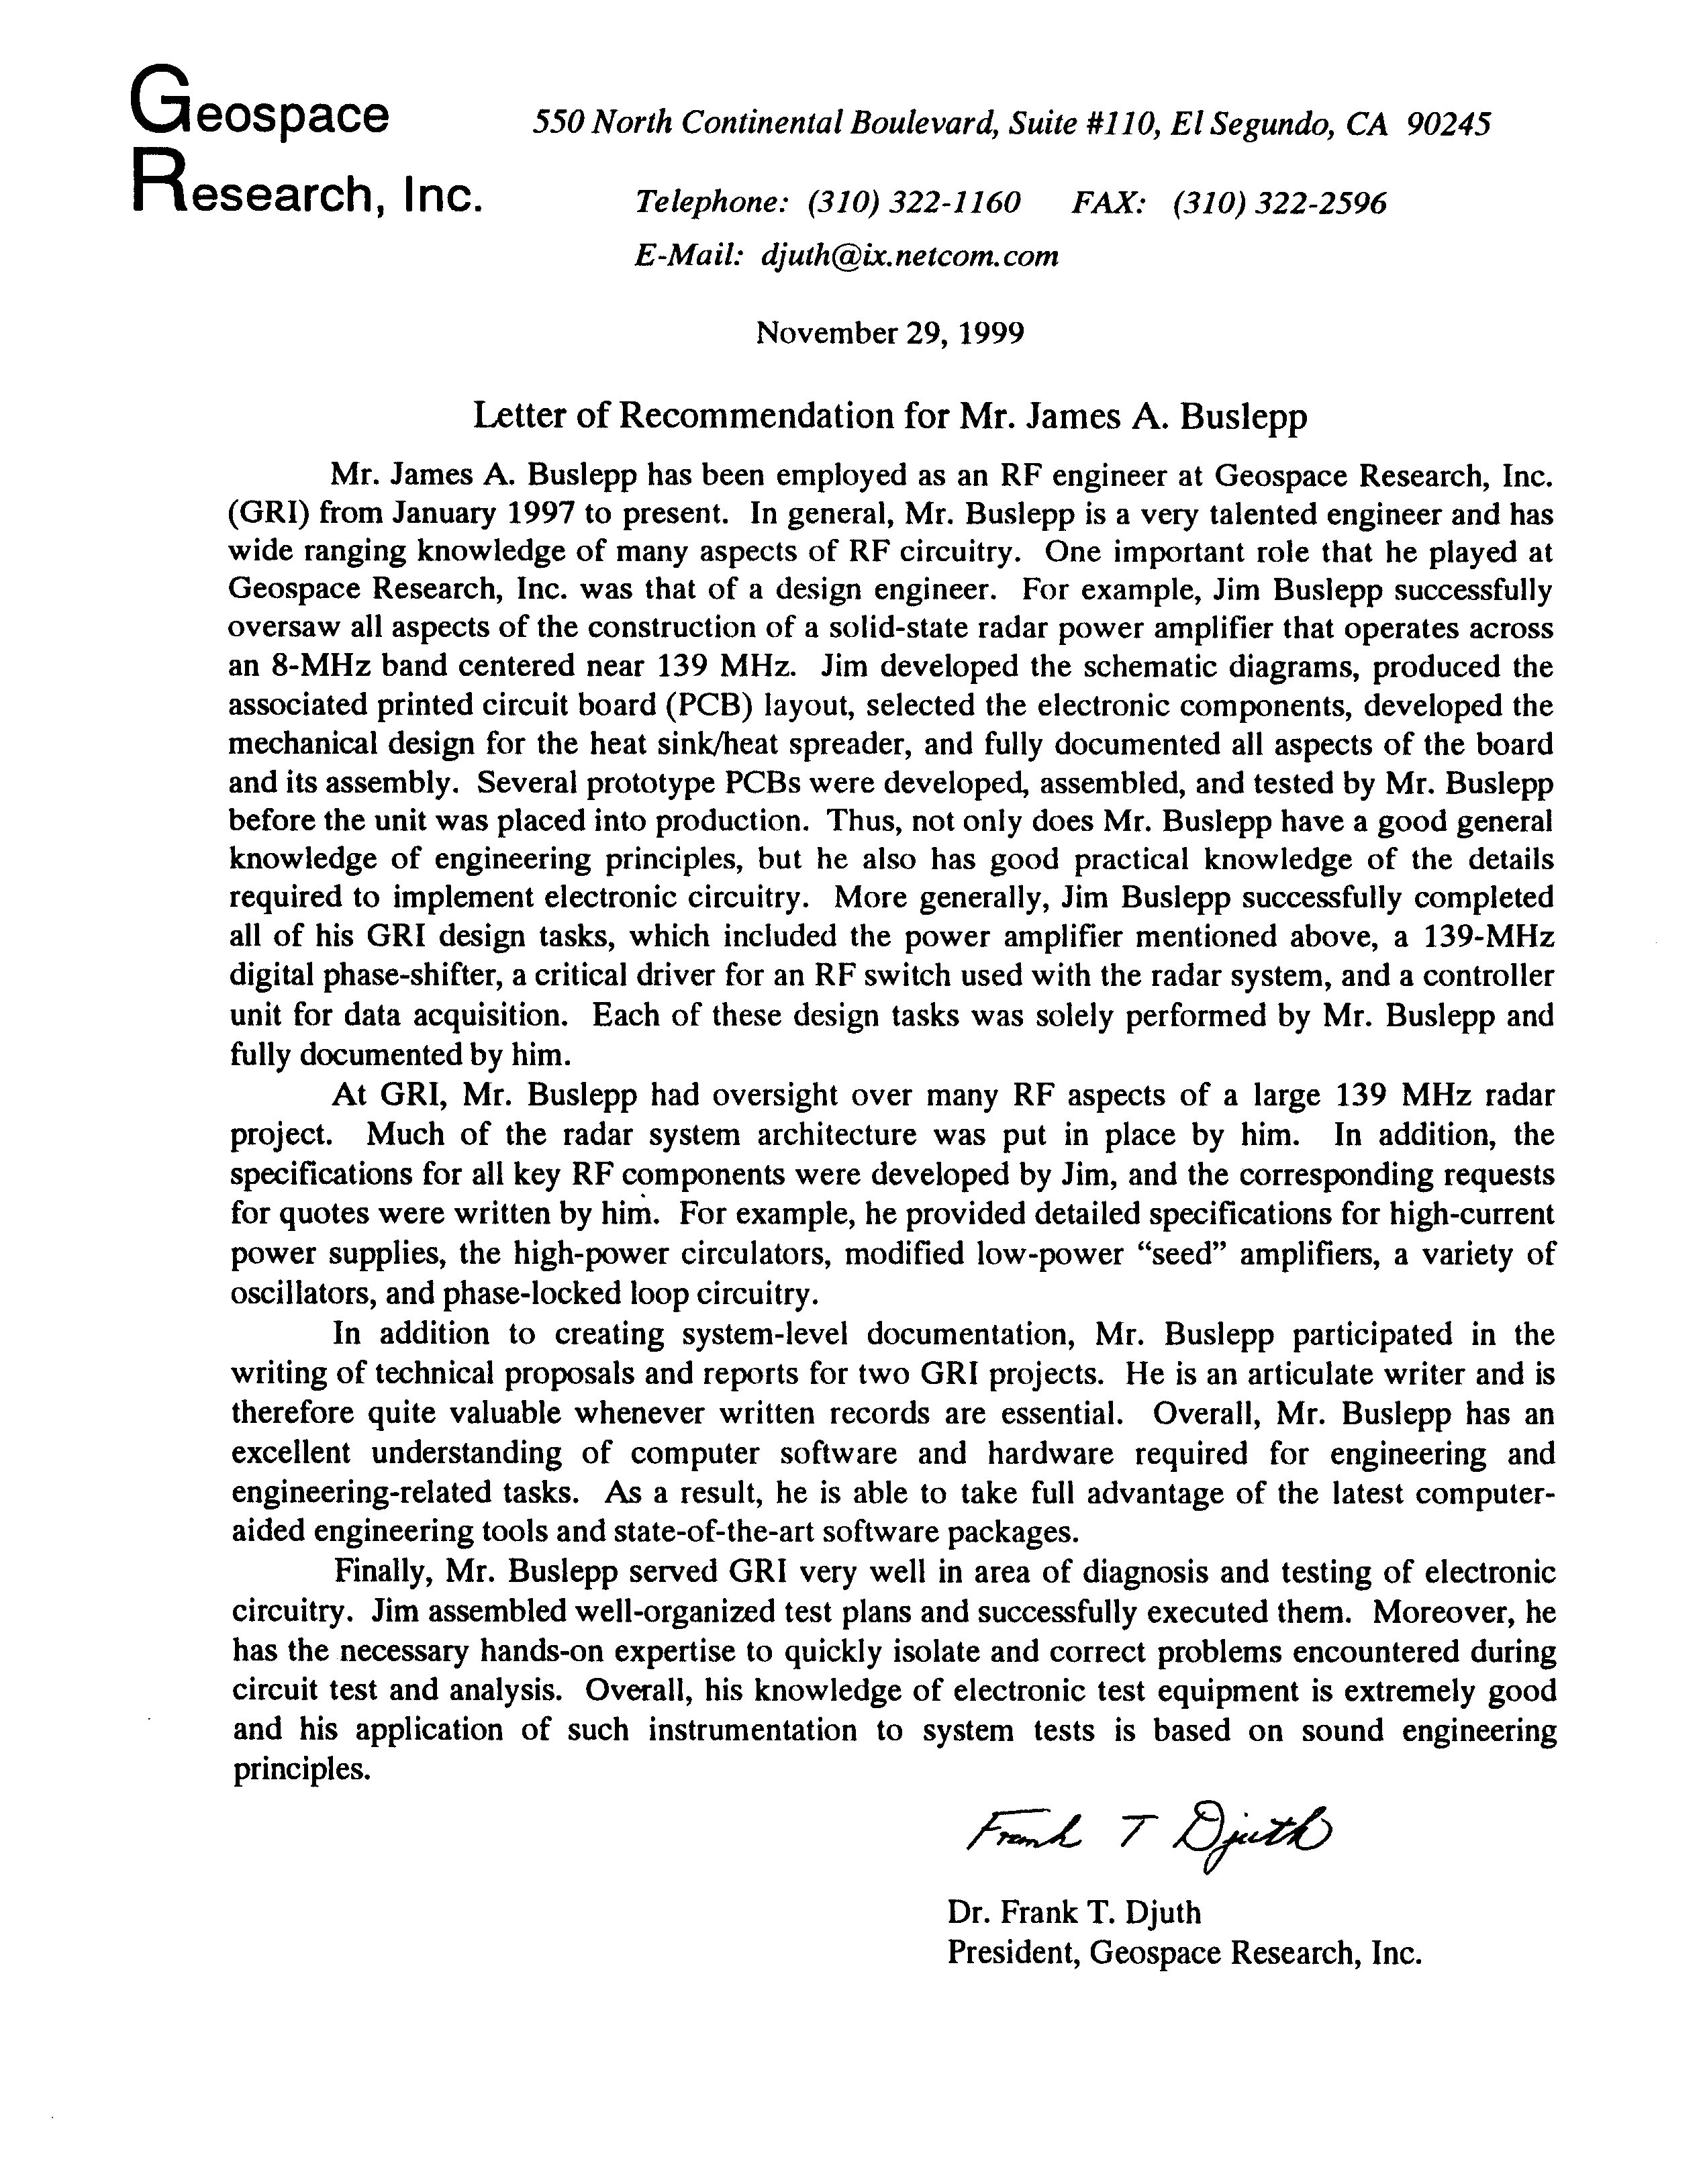 001 Essay Example Good Medical School Essays Examples Pics Diversity Sample Harvard Secondary Application Med Personal Statement Best Full